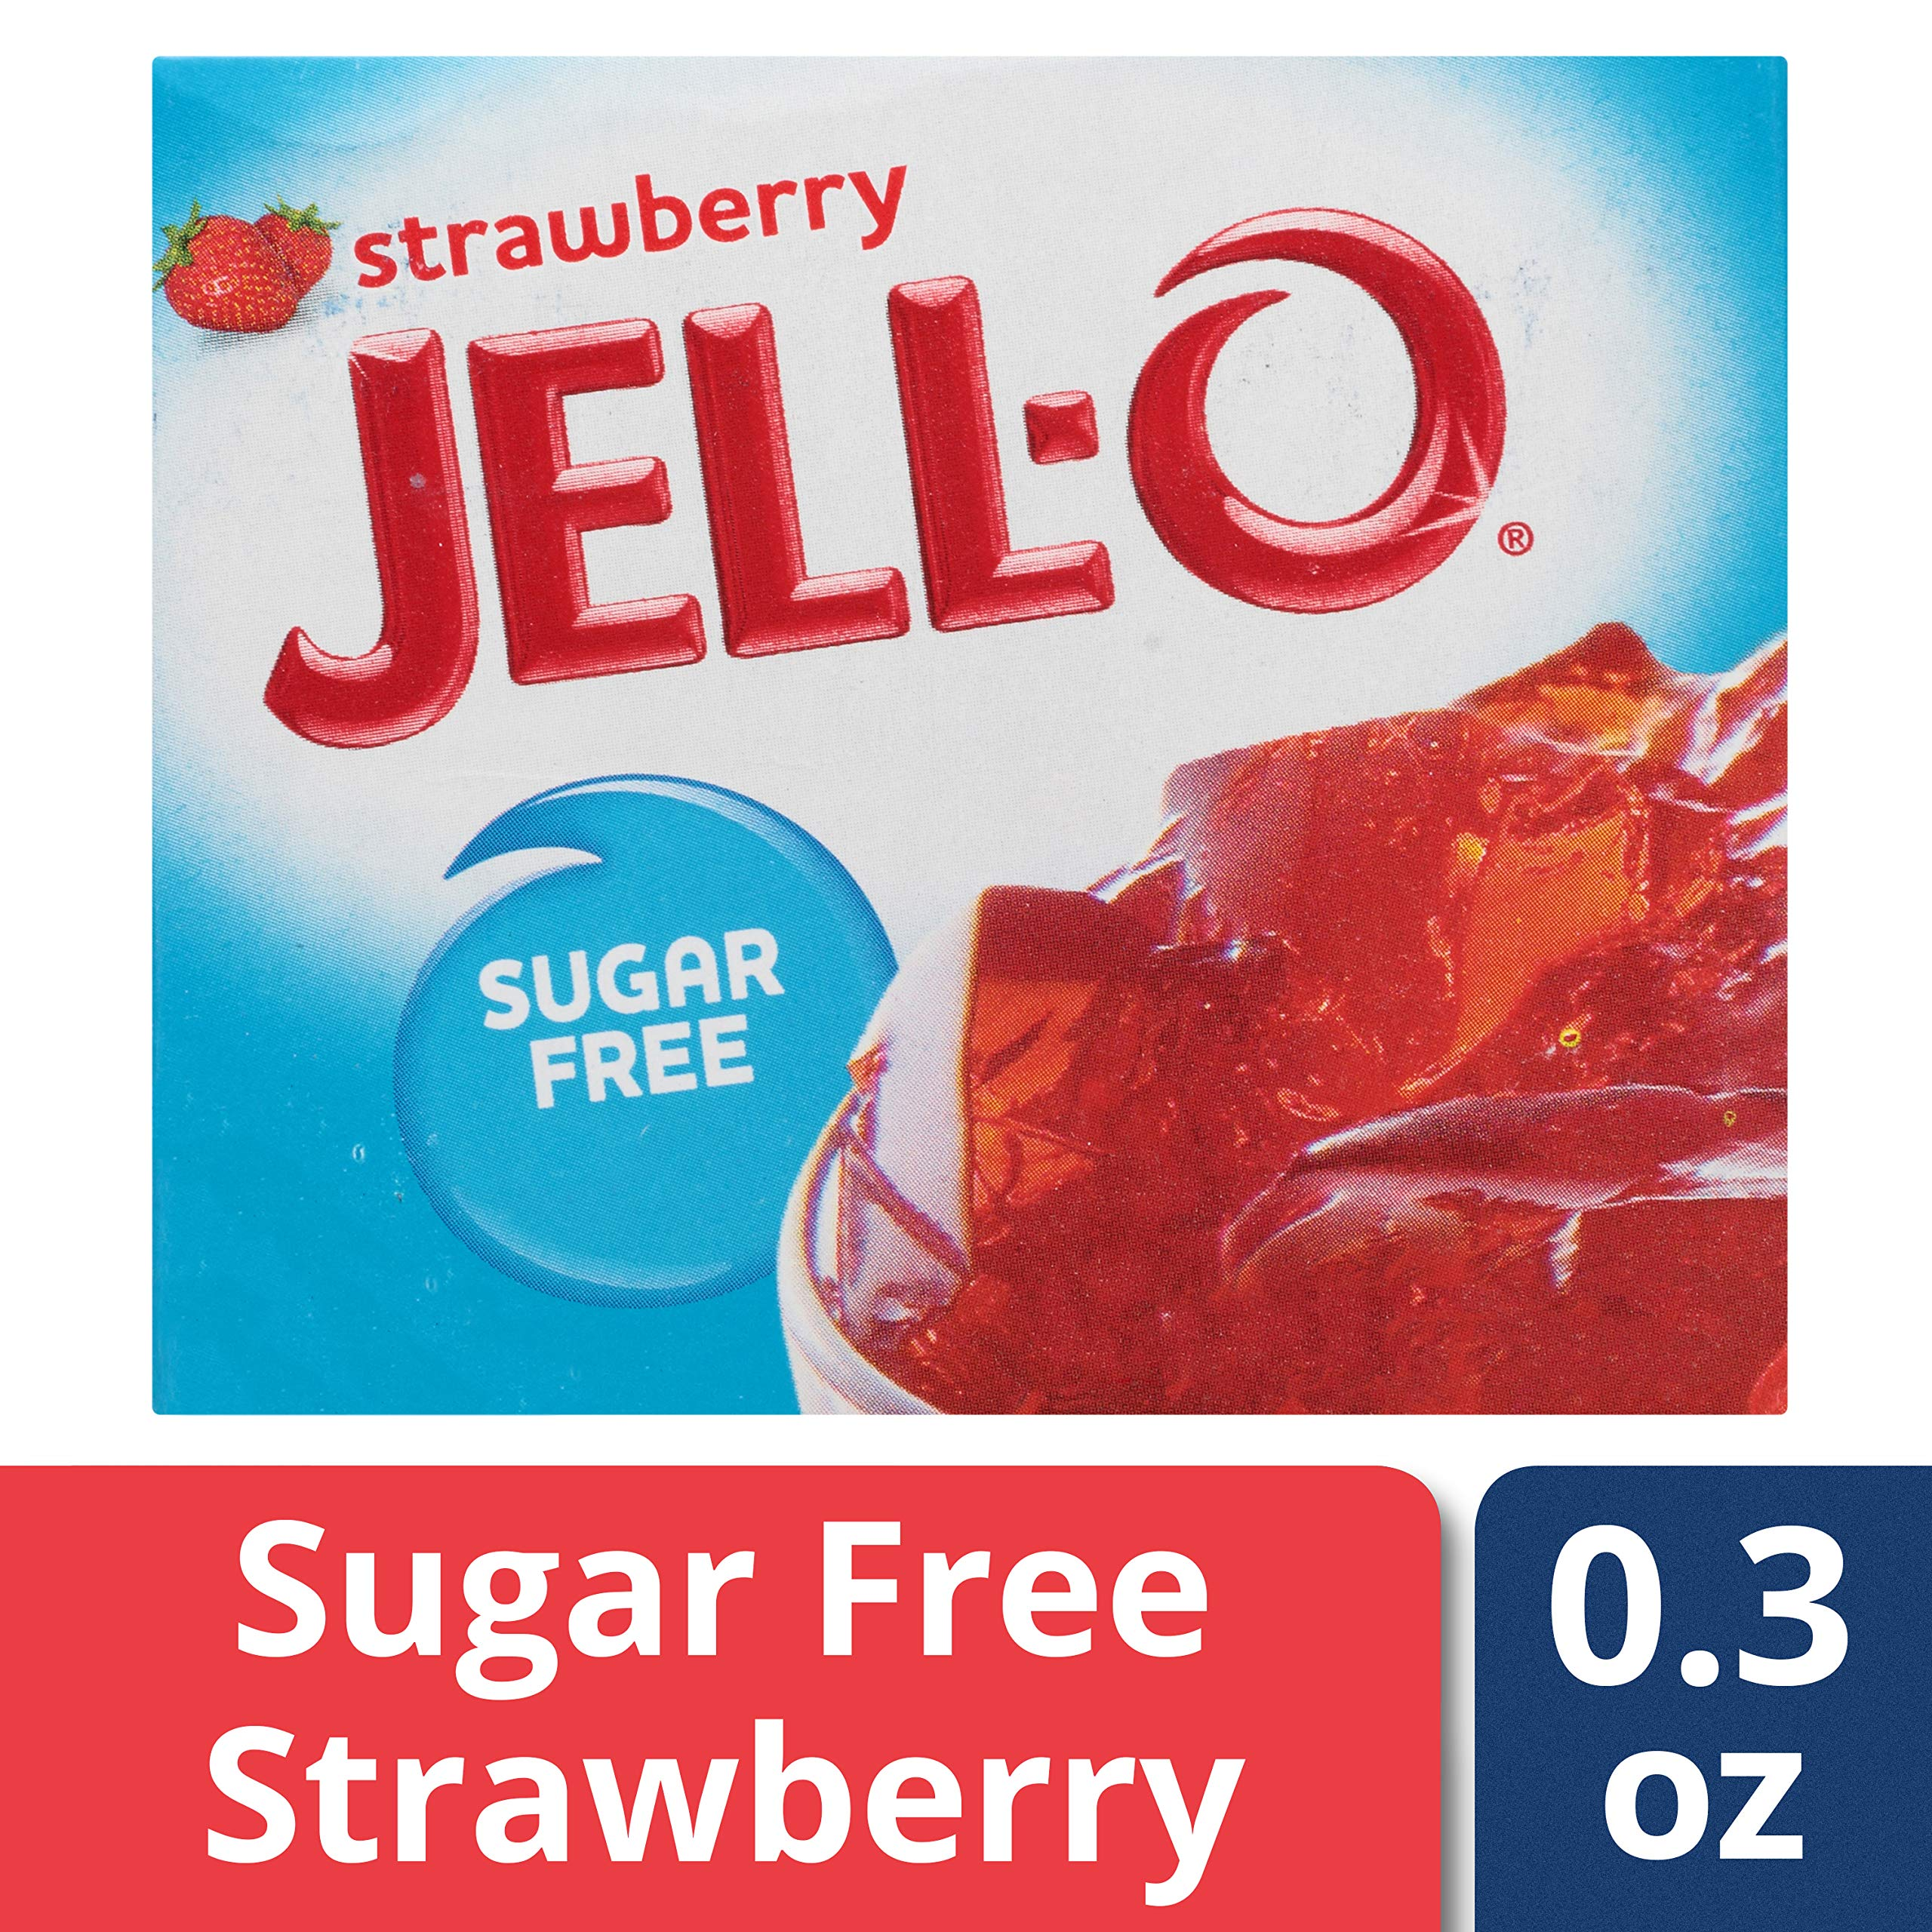 Jell-O Sugar-Free Strawberry Gelatin Dessert Mix, 0.3 oz Bag